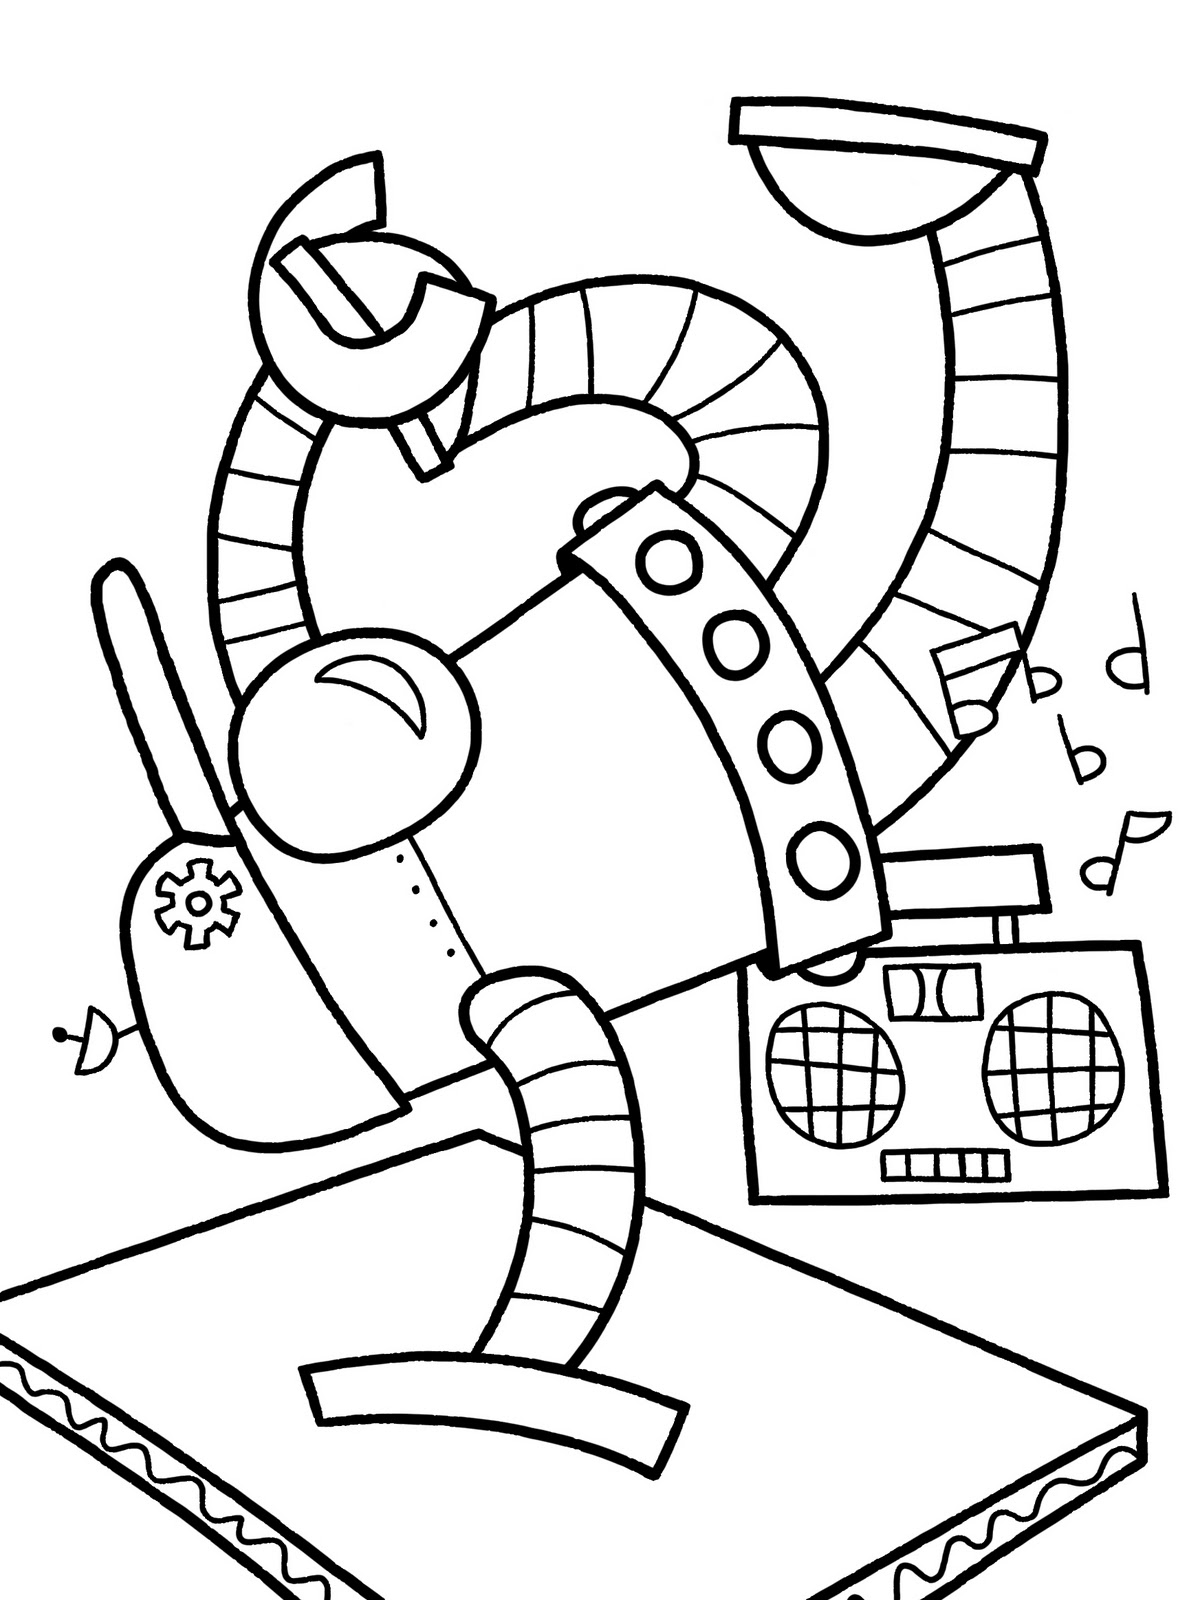 Best Colorear Godzilla Robot Coloring Pages Line Art